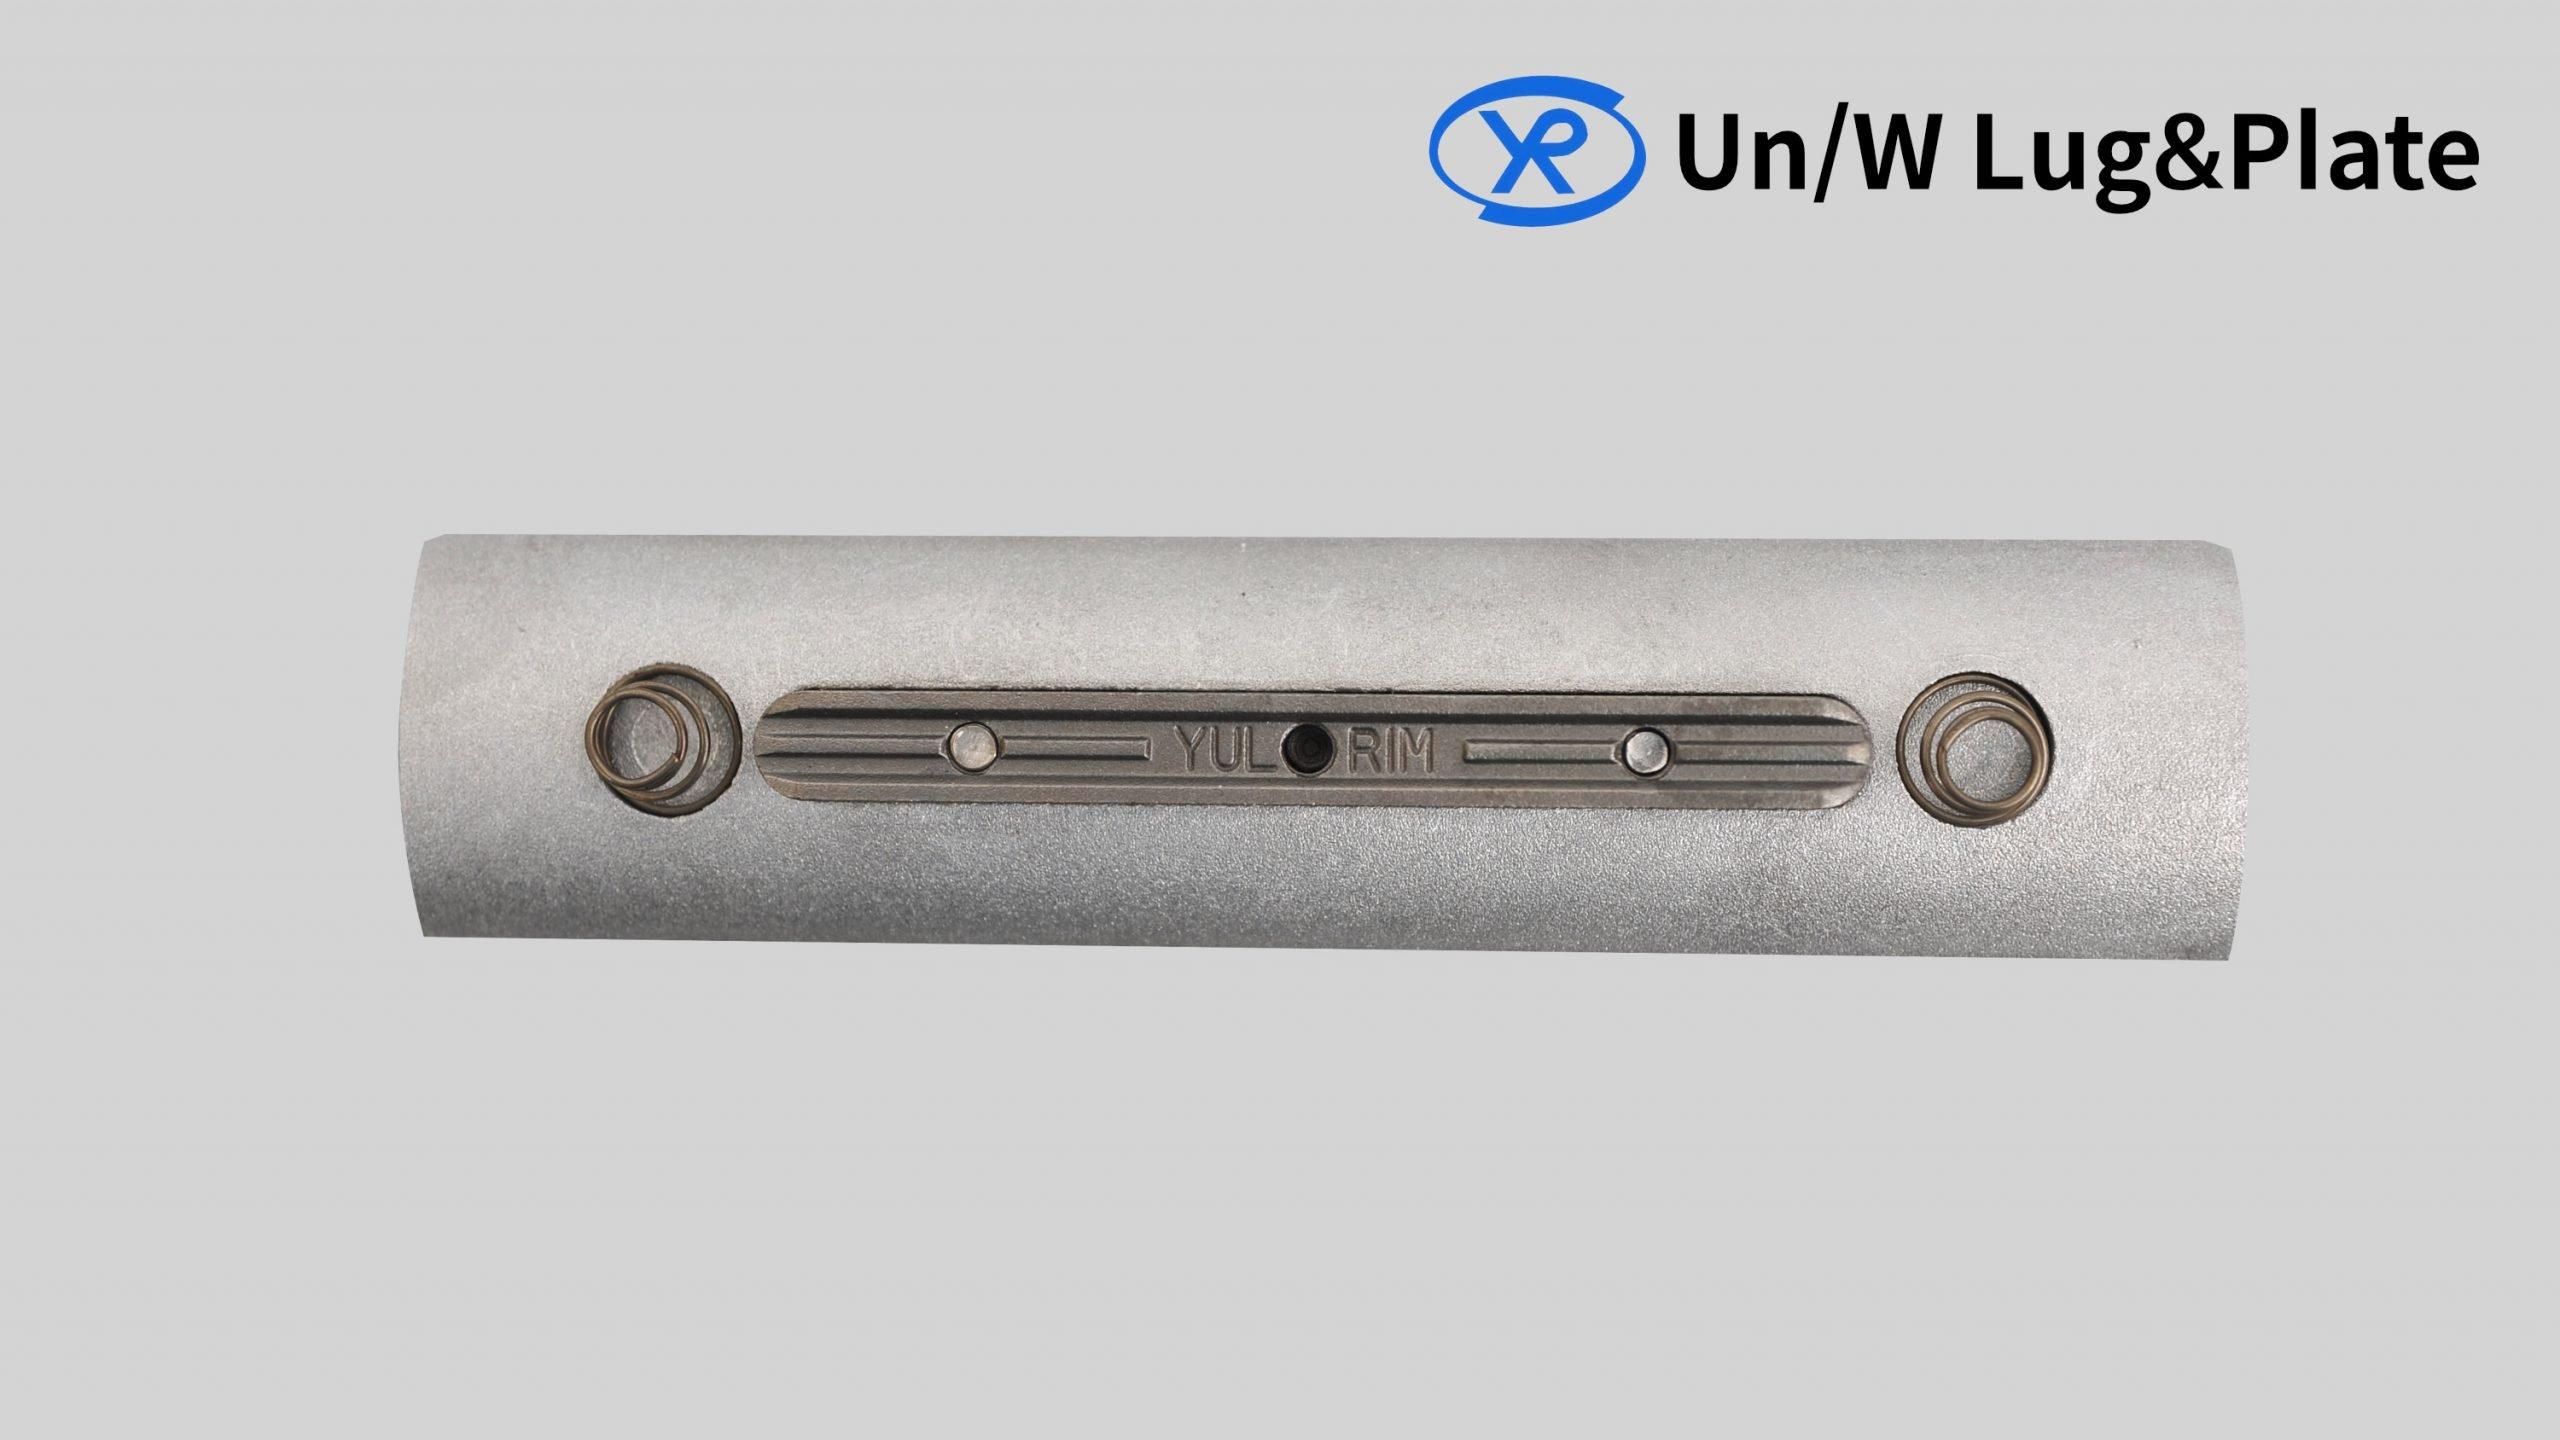 Un/W Lug&Plate